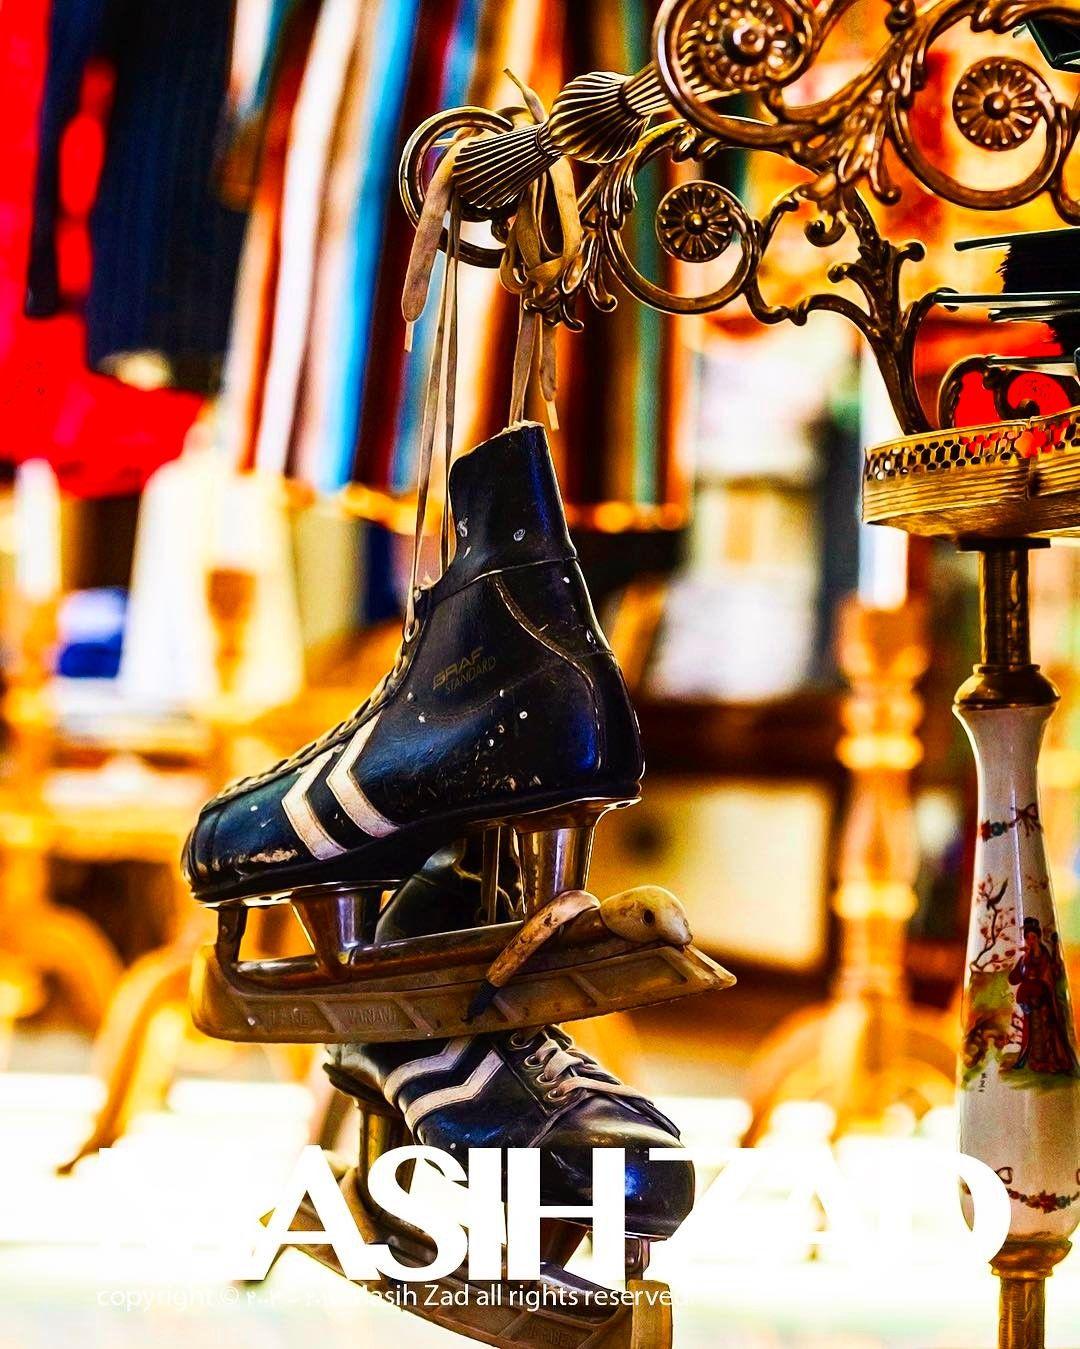 Wearable piece of art by Masih Zad Custom Made & Made to Measure Mens clothing, Cut and Tailored by Hands in Naples, Italy. Now in Tehran, by appointment 📞 0098-912-931-2287 0098-21-22717194 #masihzad  كلكسيونئ از تاكسيدوهاً و كت وشلوارهائ طراحي شده مسيح زاد همراه با دوخت سفارشي و اختصاصي آقايان و با مجربترين خياطهاي ايتاليايي و با كيفيتترين و متنوع ترين پارچههاي روز براي اولين بار در ايران. <<< يك تجربه، همراه با كيفيت و دوختي متمايز >>> نشاني : تهران، خيابان نياوران و تنها با تعيين…